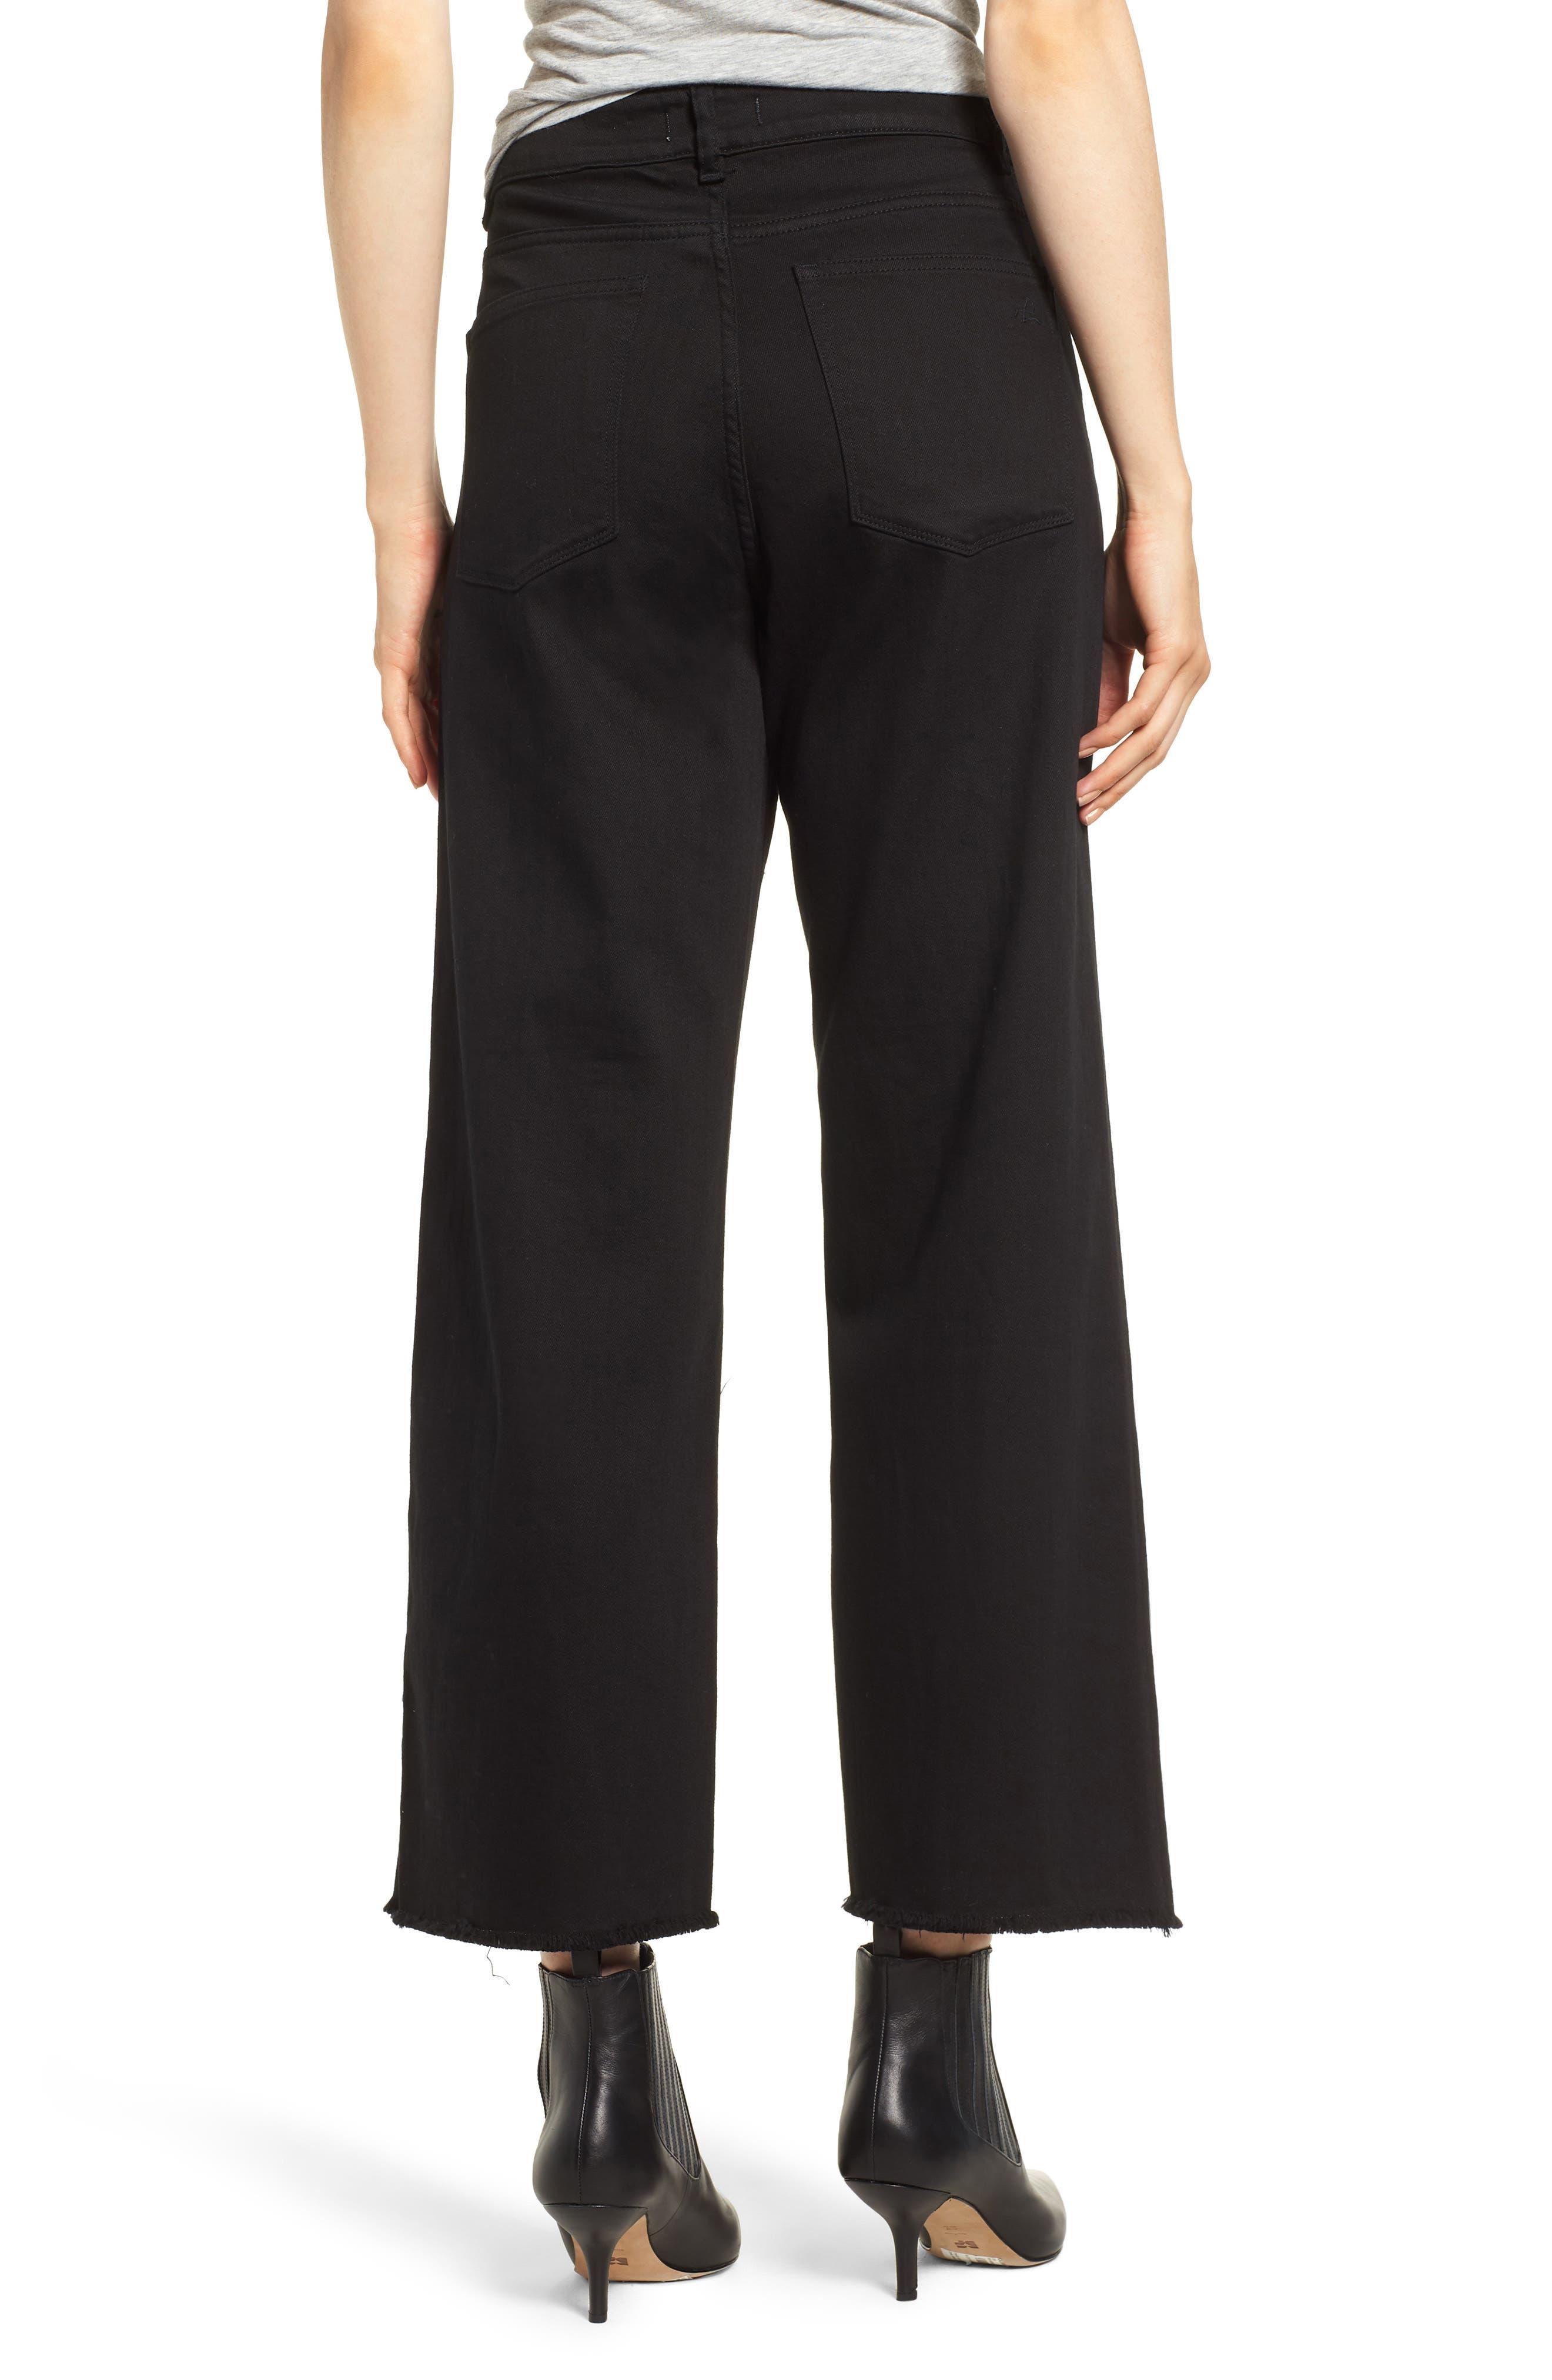 Hepburn High Waist Raw Hem Wide Leg Jeans,                             Alternate thumbnail 2, color,                             001